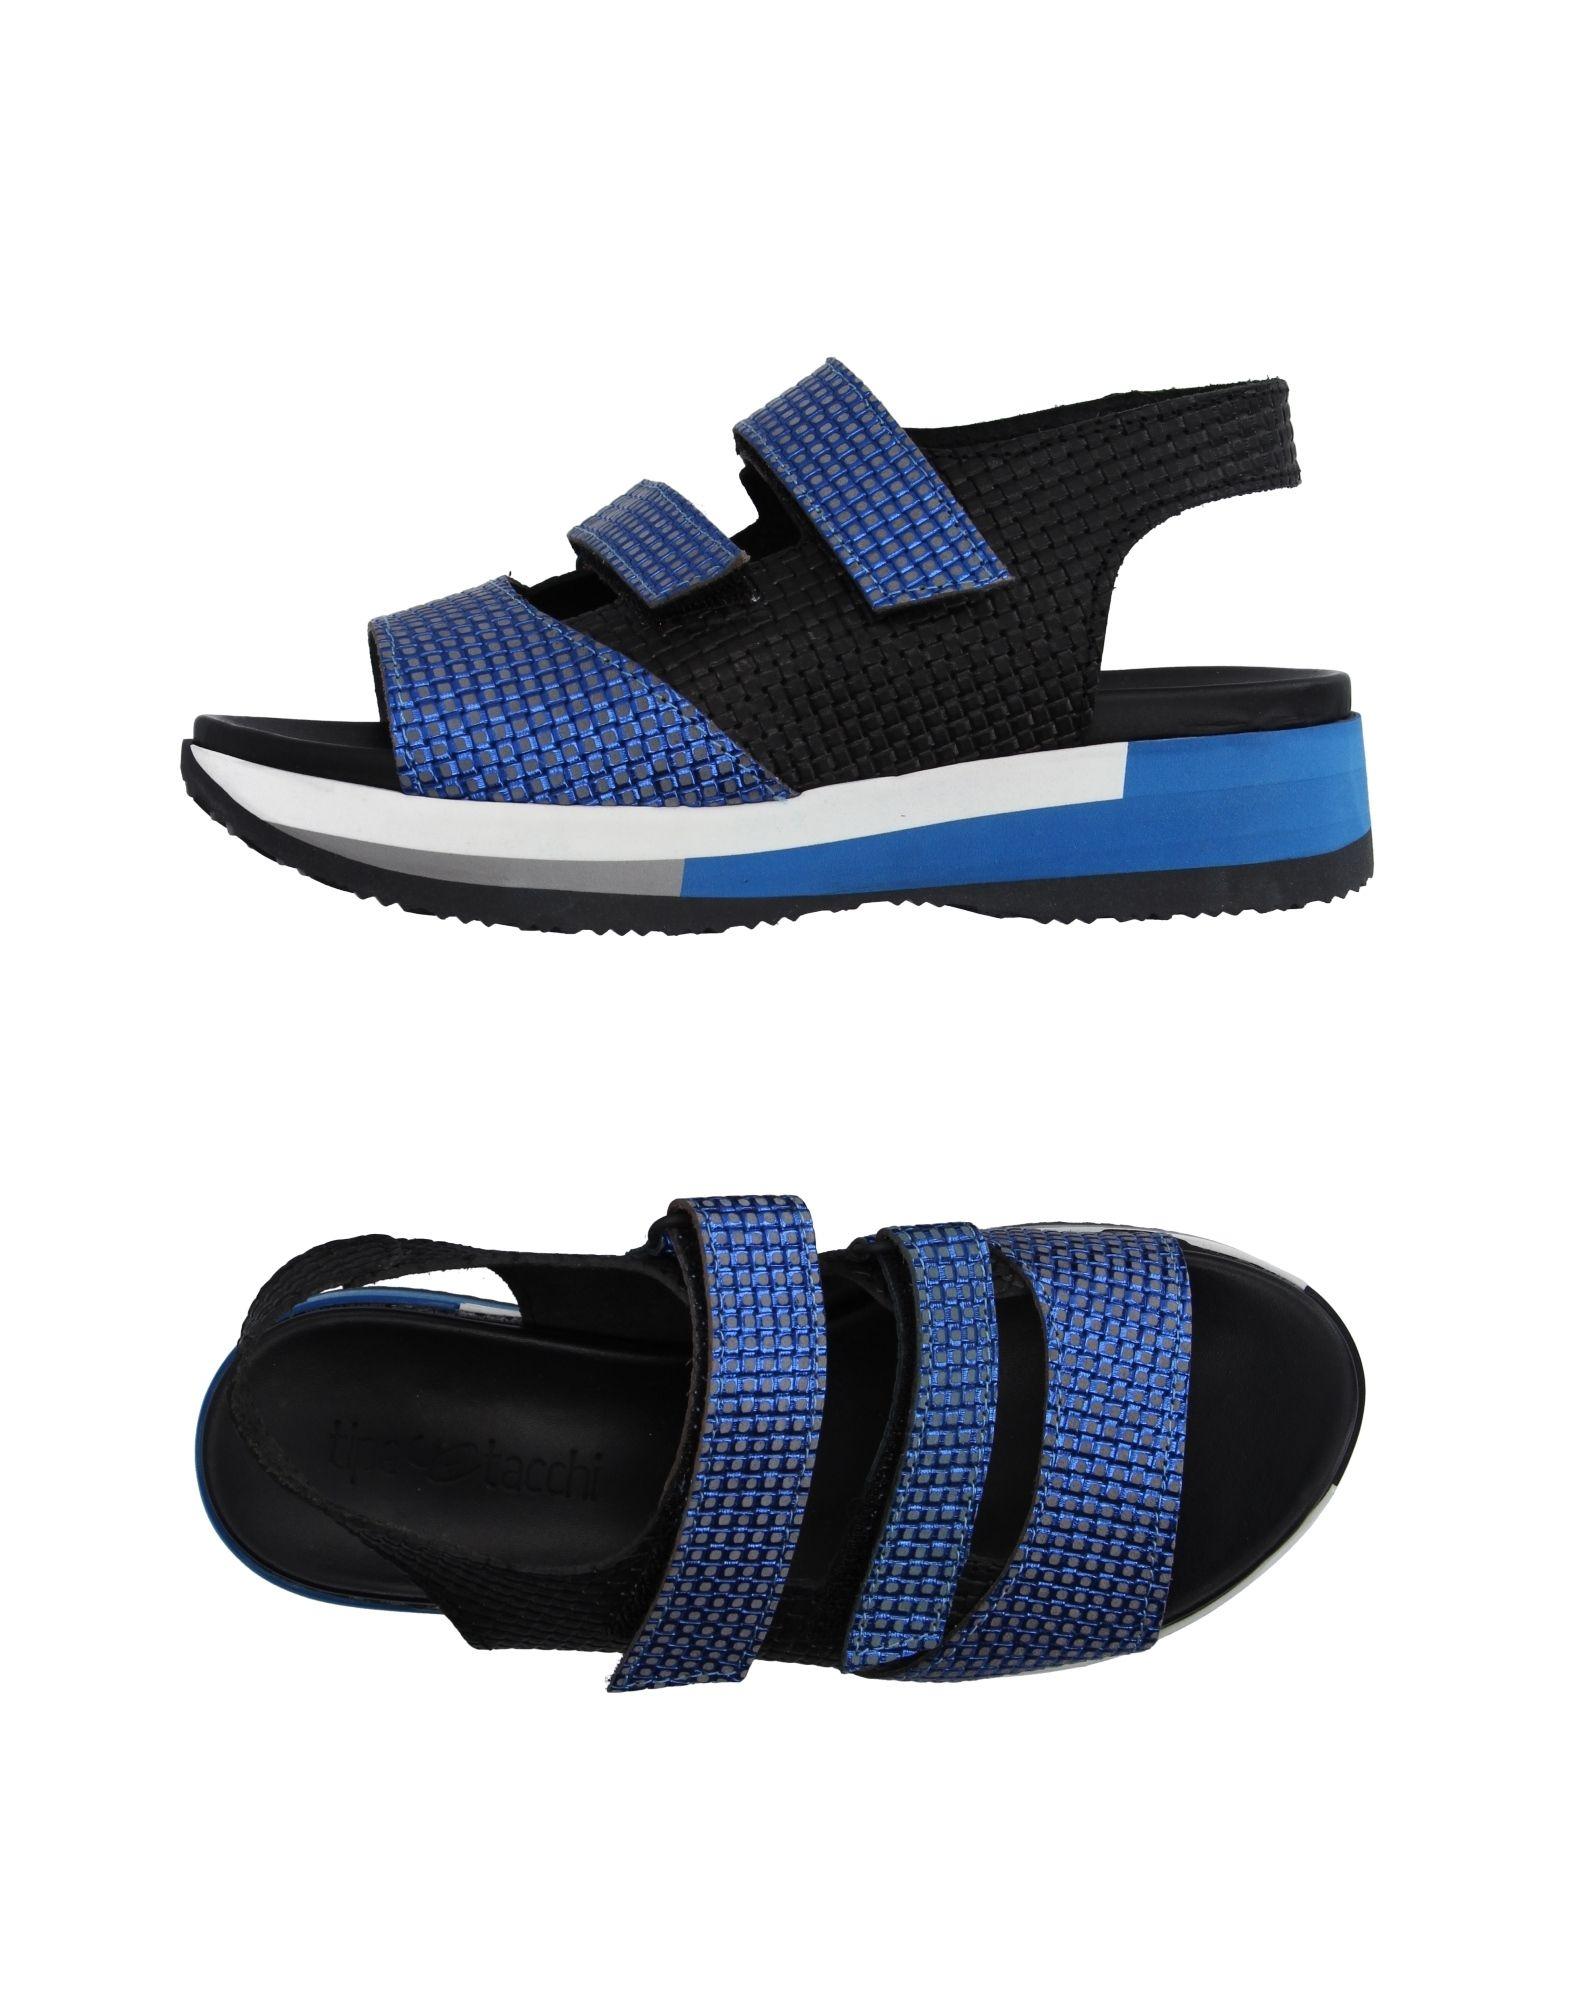 Tipe E Tacchi Sandalen Qualität Damen  11137830EJ Gute Qualität Sandalen beliebte Schuhe f0f2d9